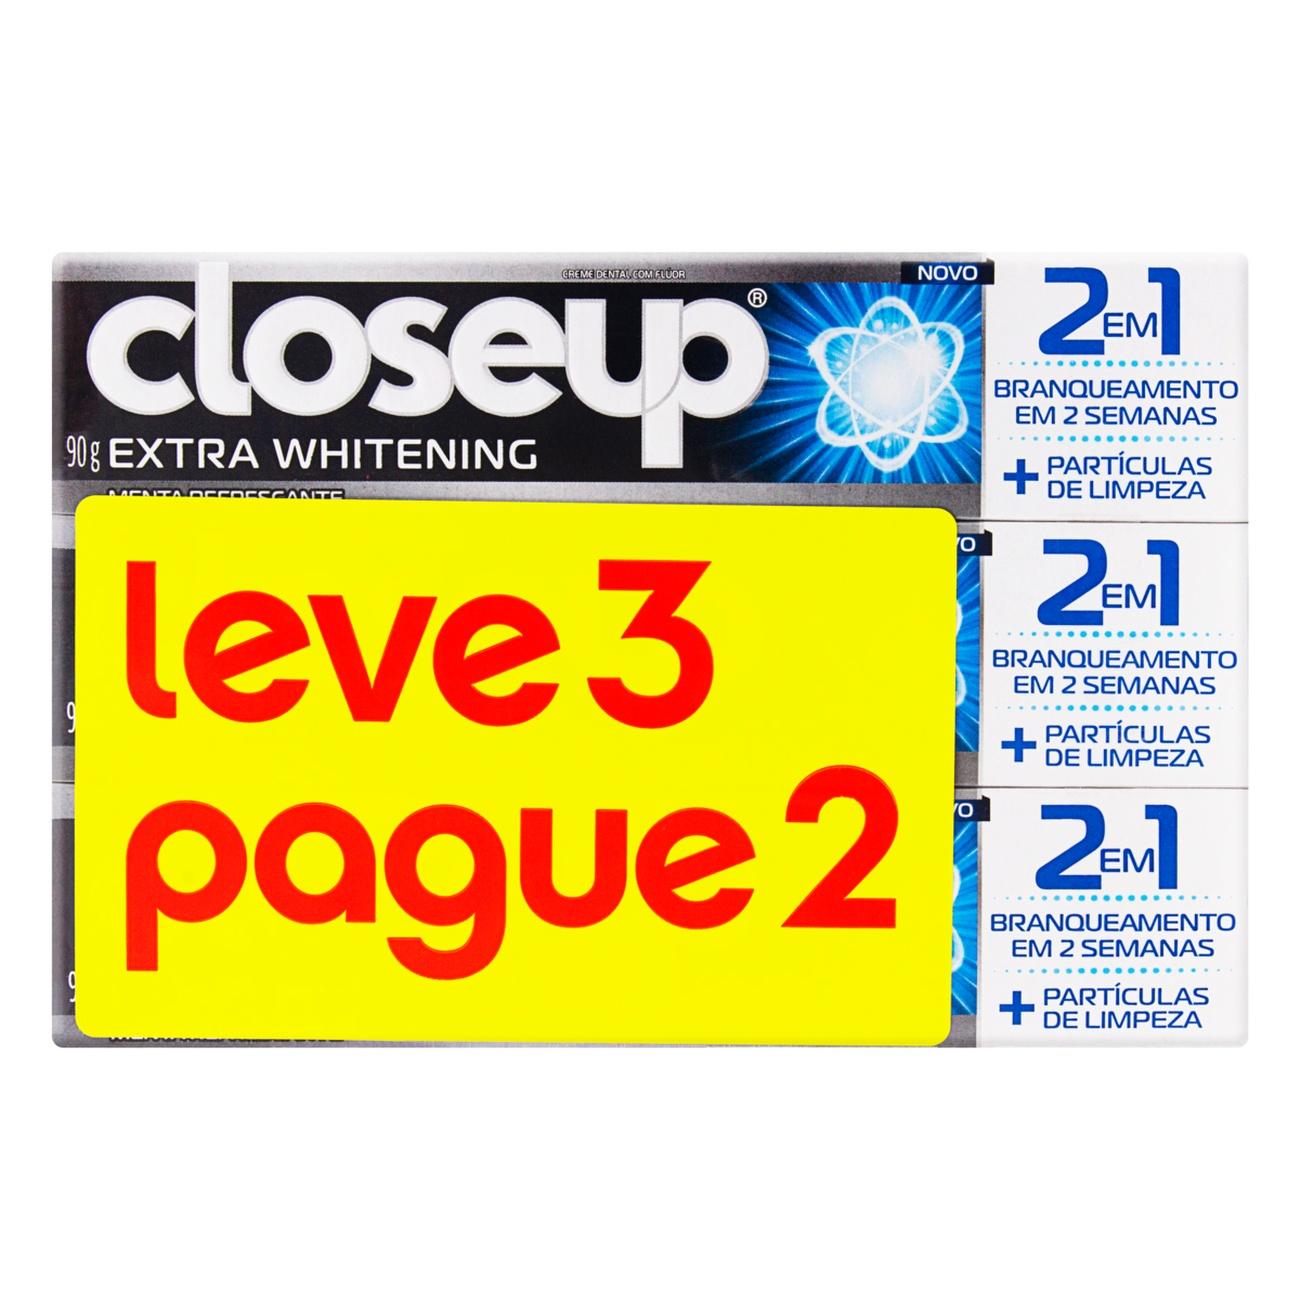 Oferta Creme Dental Closeup Extra Whitening Leve 3 Pague 2 90g